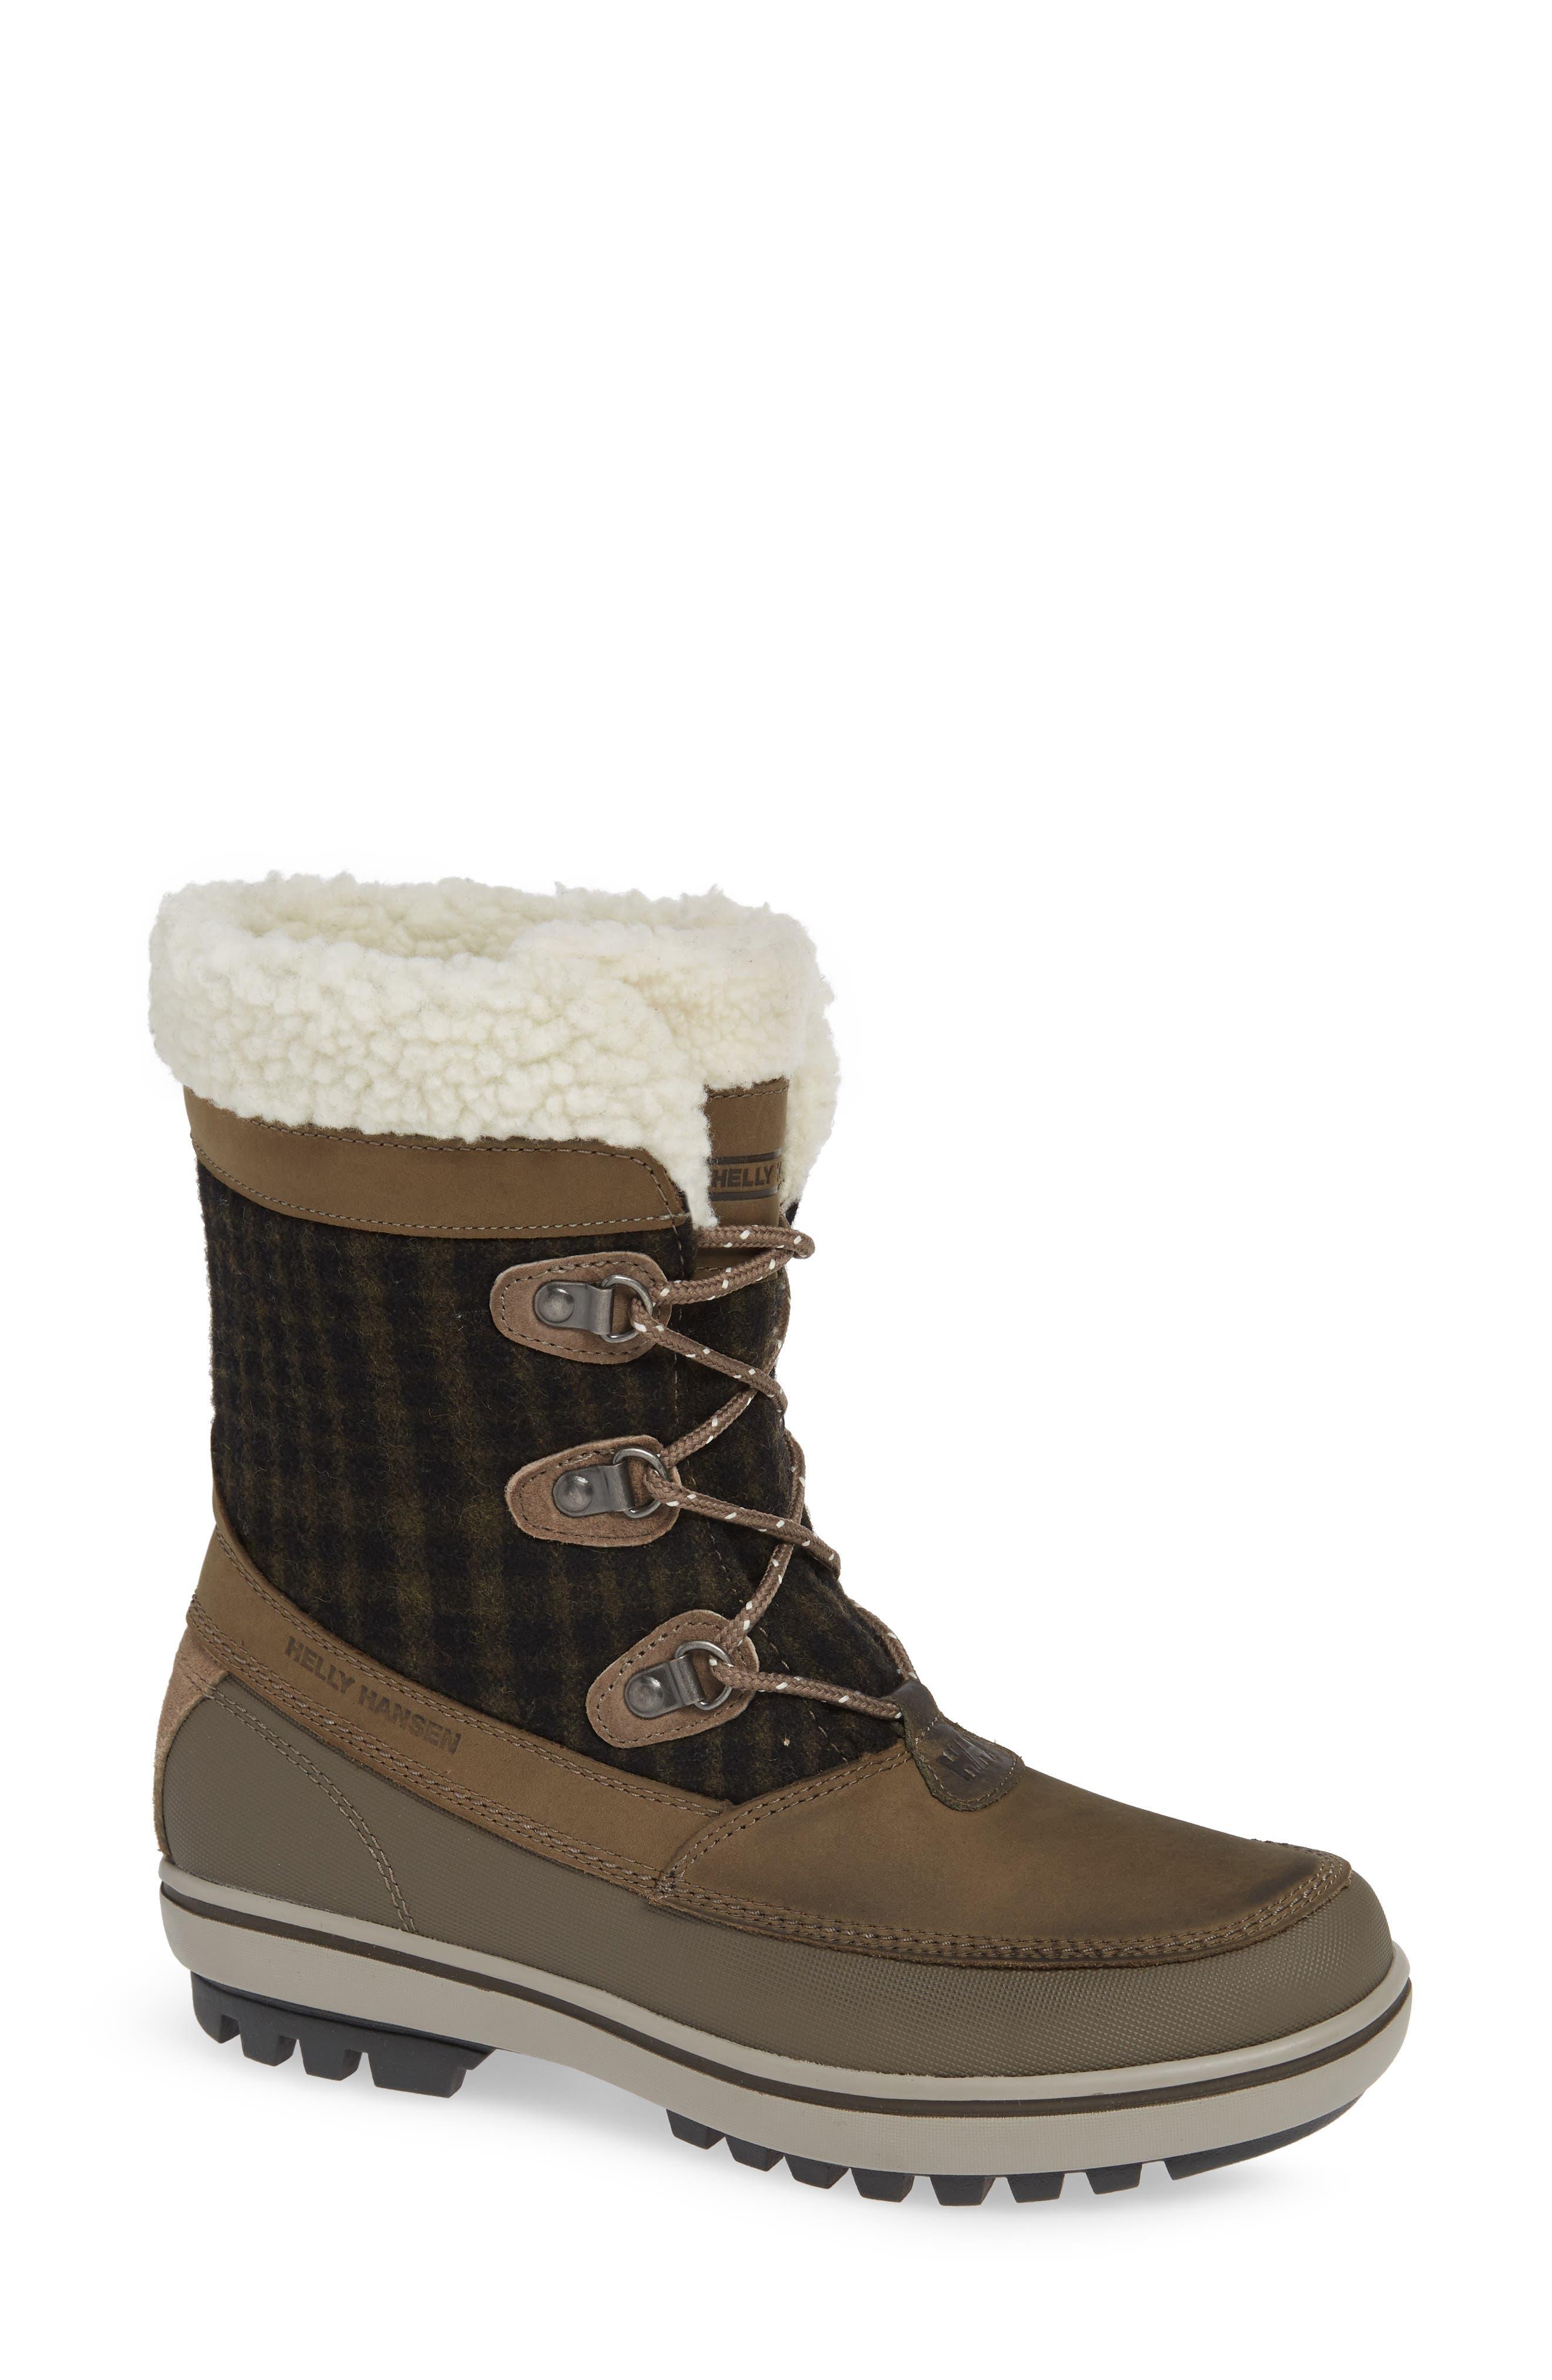 Georgina Snow Waterproof Boot in Goose/ Major Brown